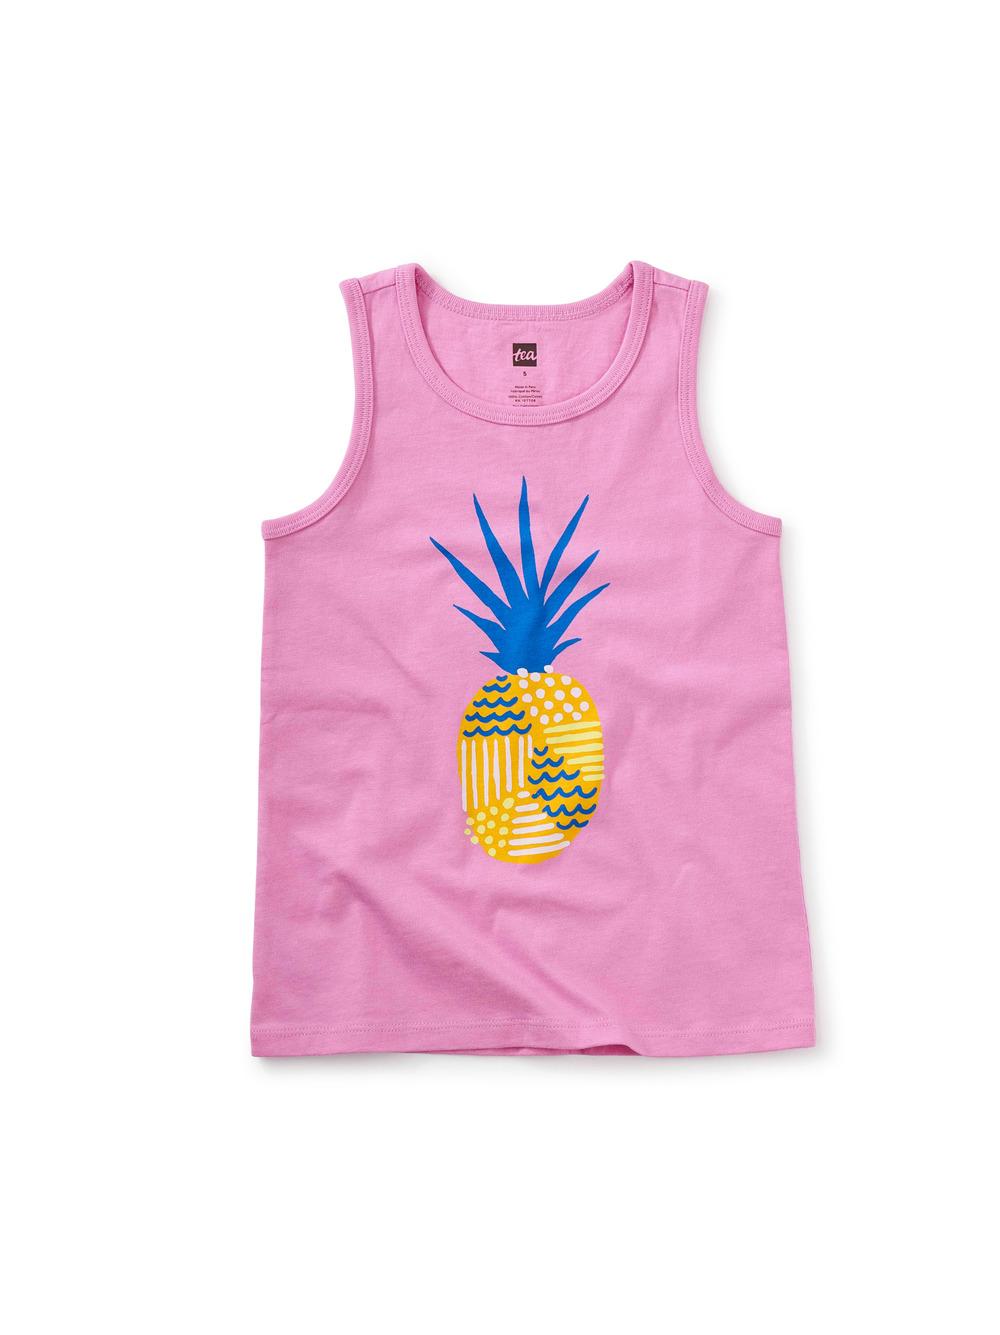 Pretty Pineapple Tank